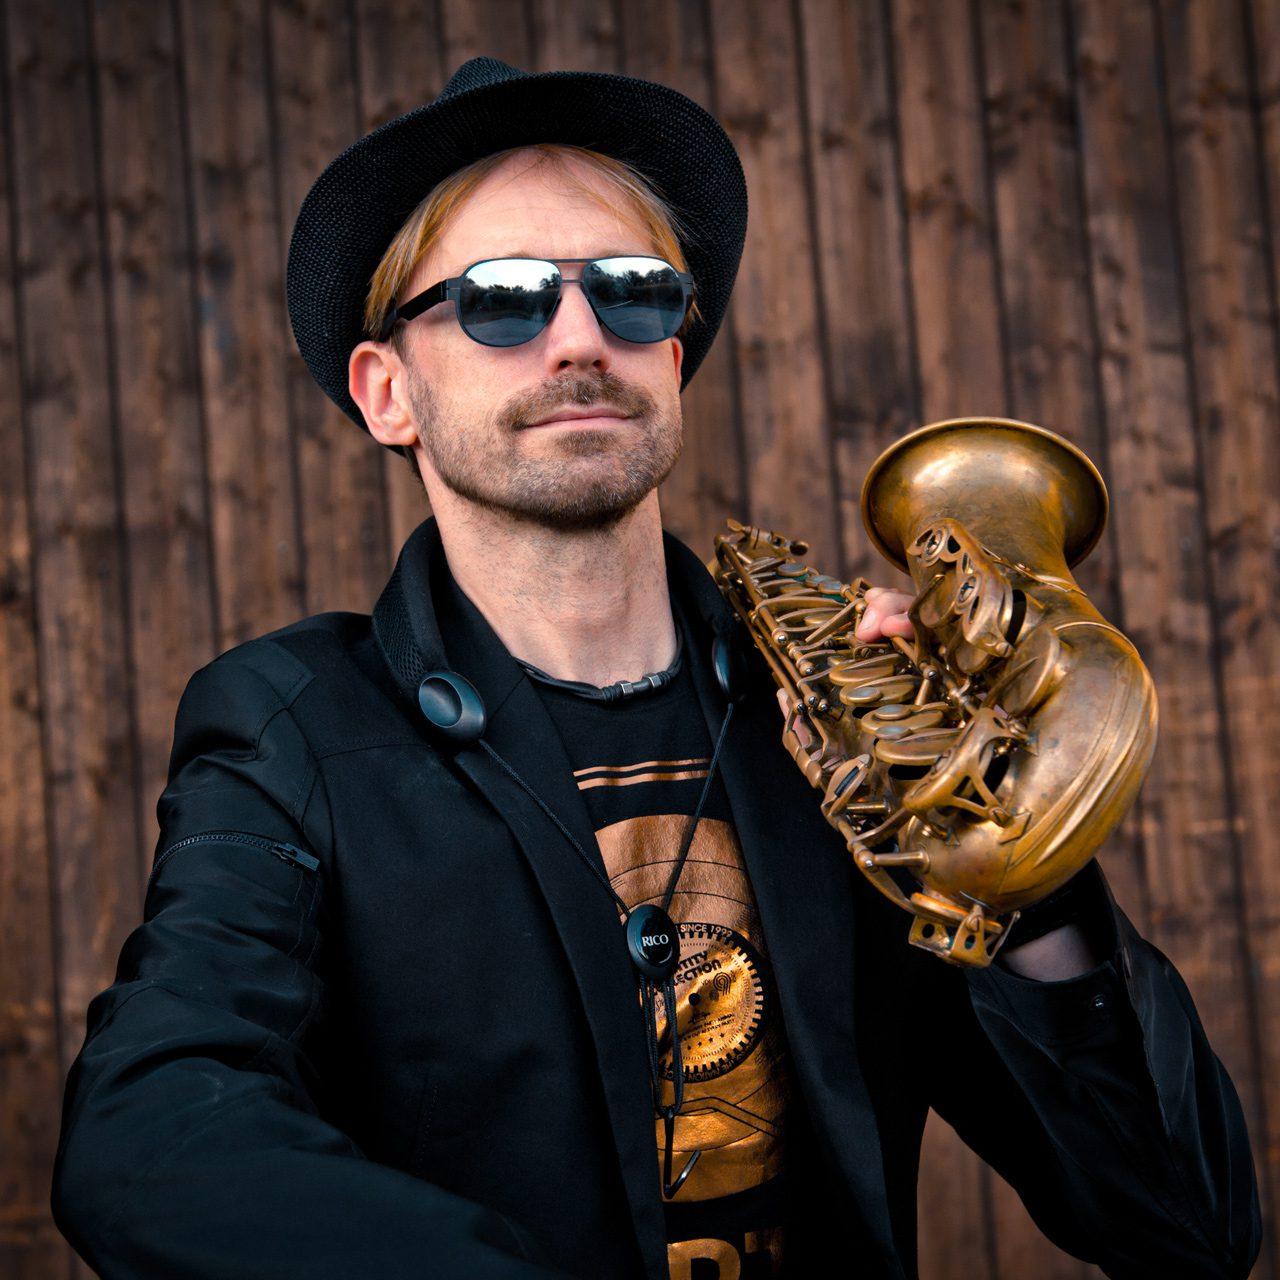 Saxophonist Mister Sax Paderborn